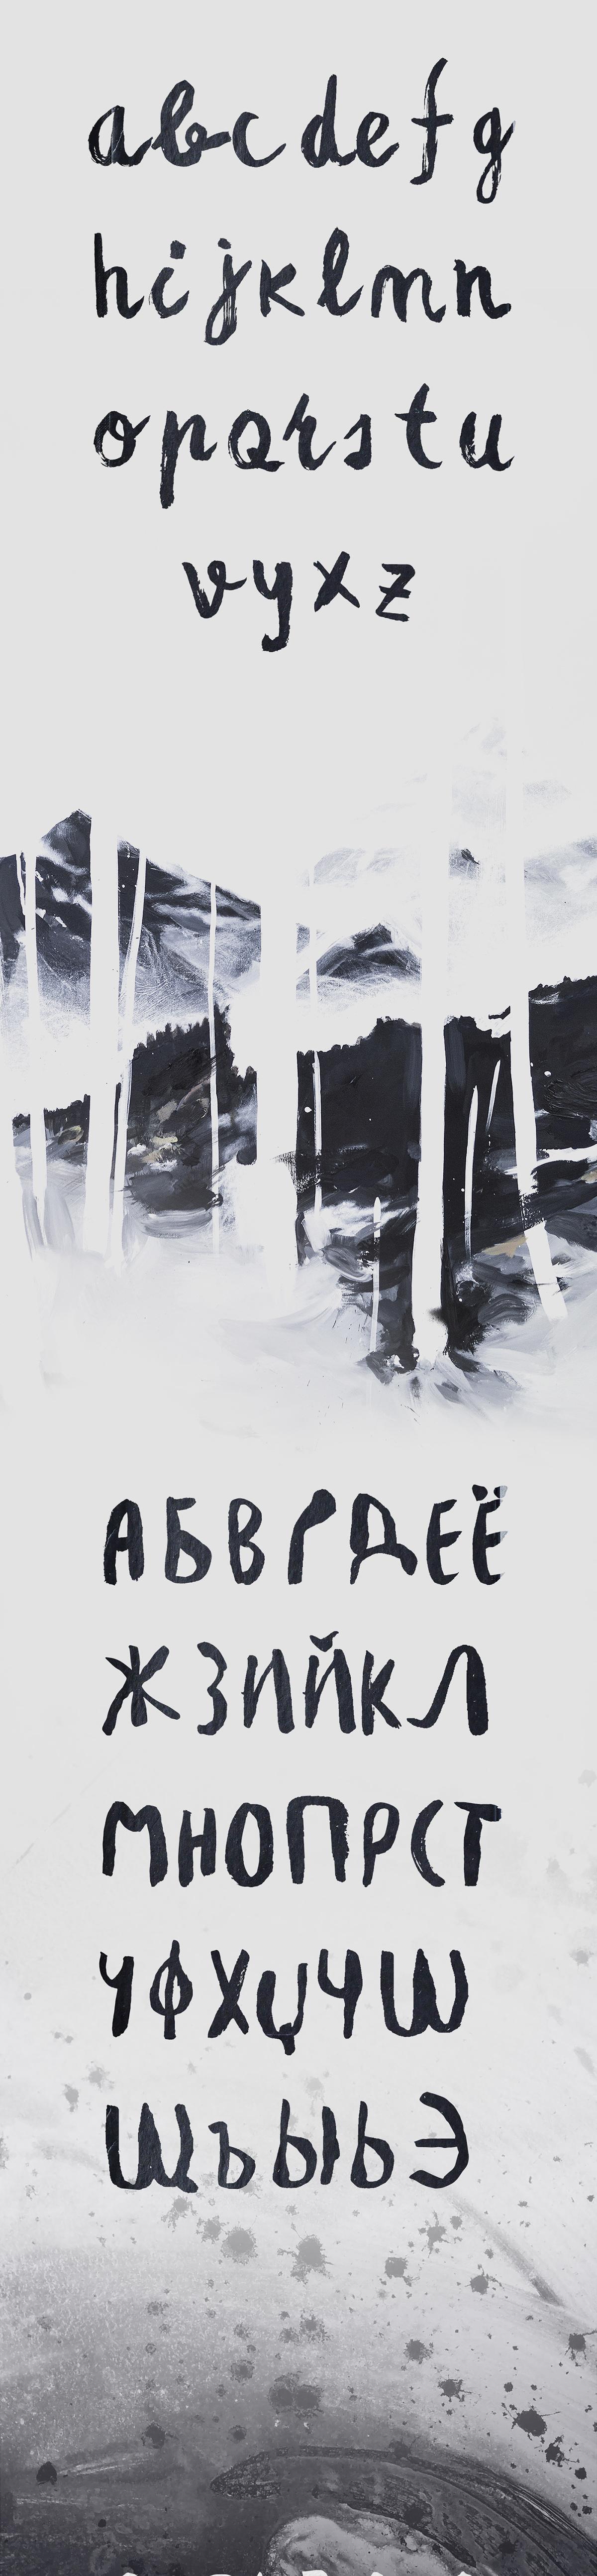 BESOM Extended Brush font Free font Brush font free brush font latin extended cryllic Typeface russian font fre